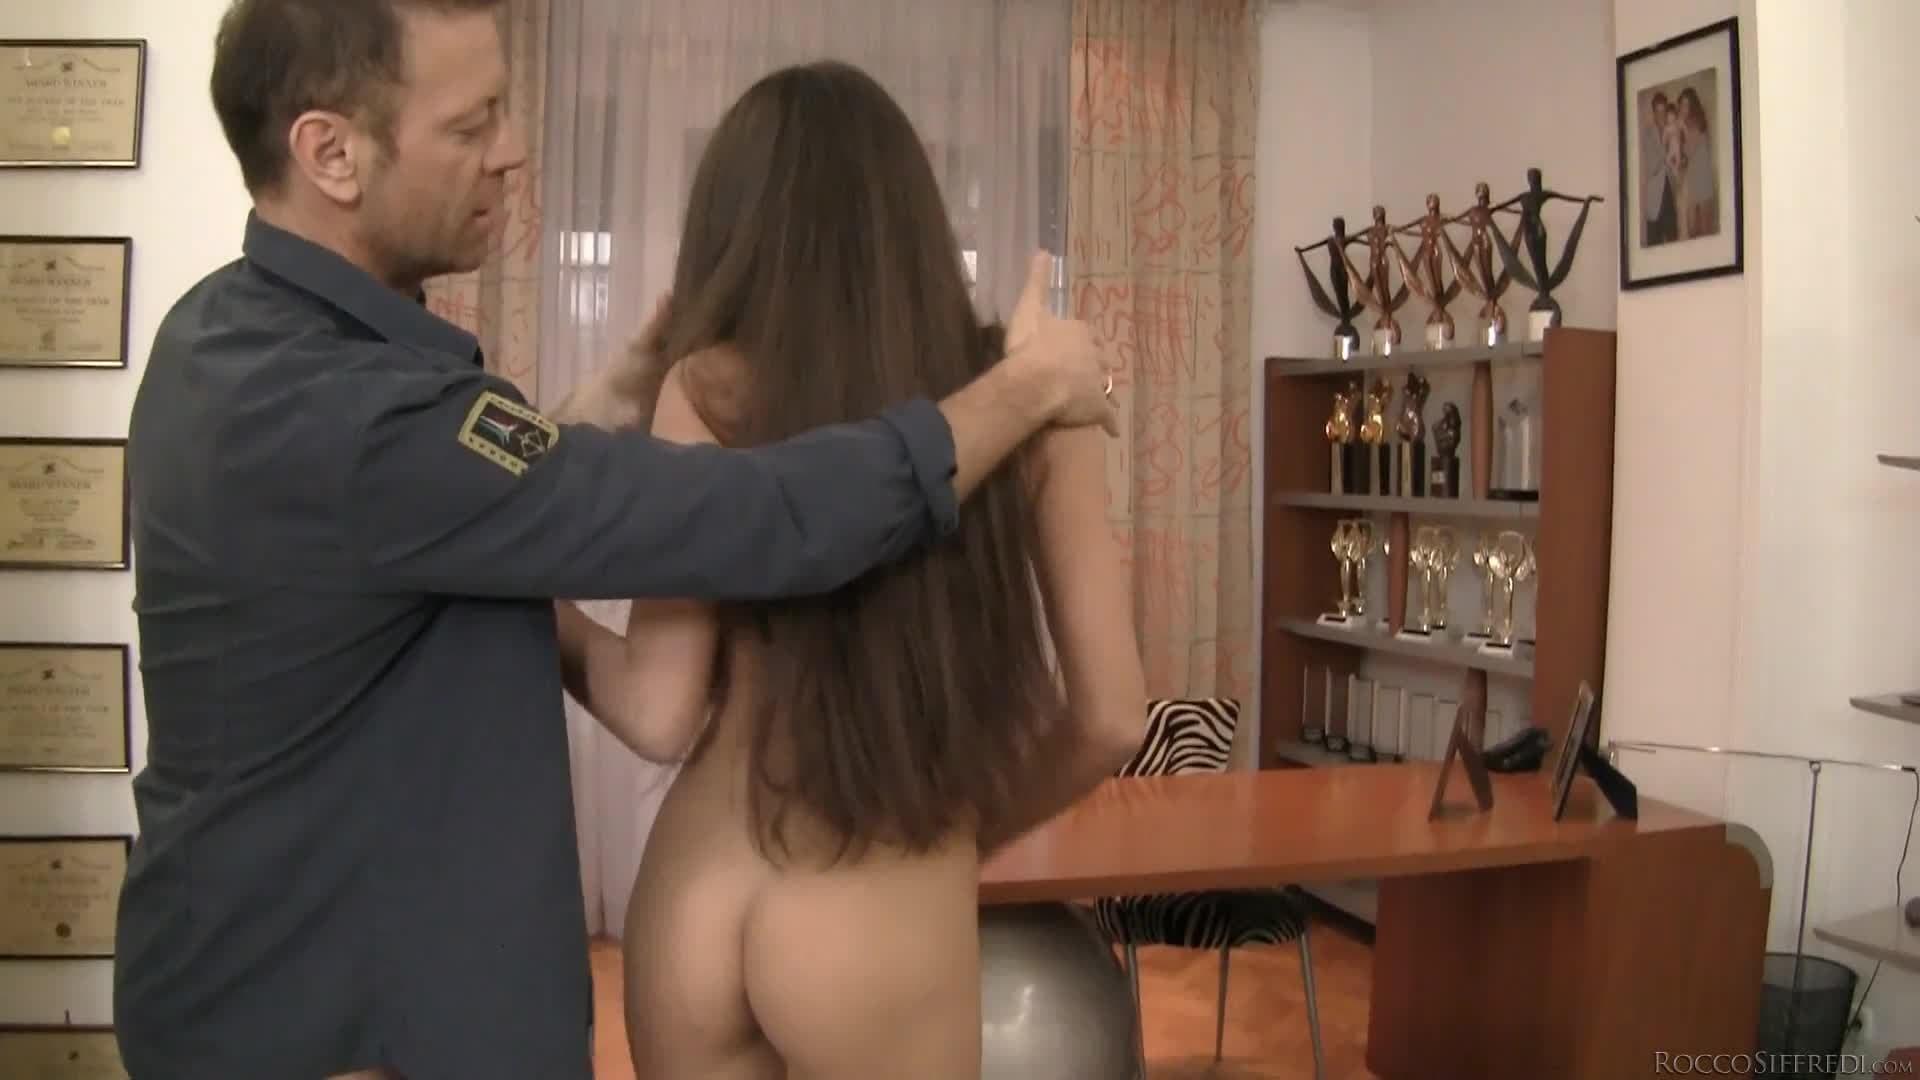 Agnessa Casting Porn nessa a has her ass penetrated for the first time - porndig